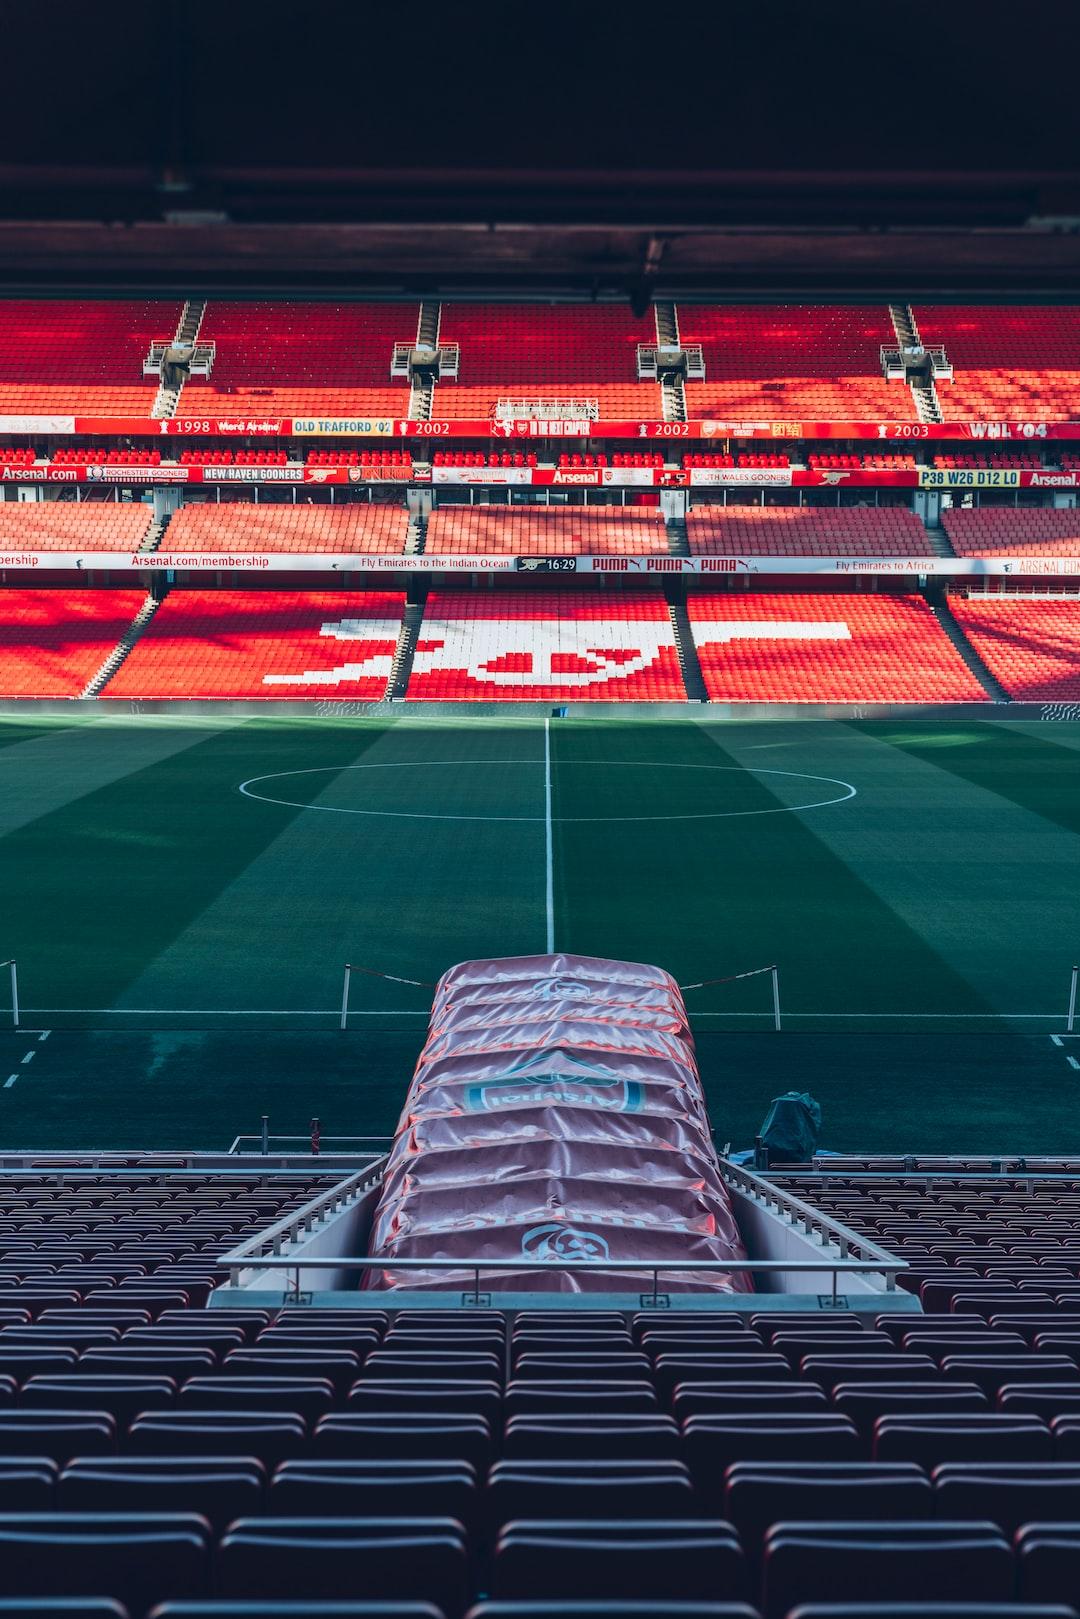 Emirates Stadium Pictures Download Free Images On Unsplash